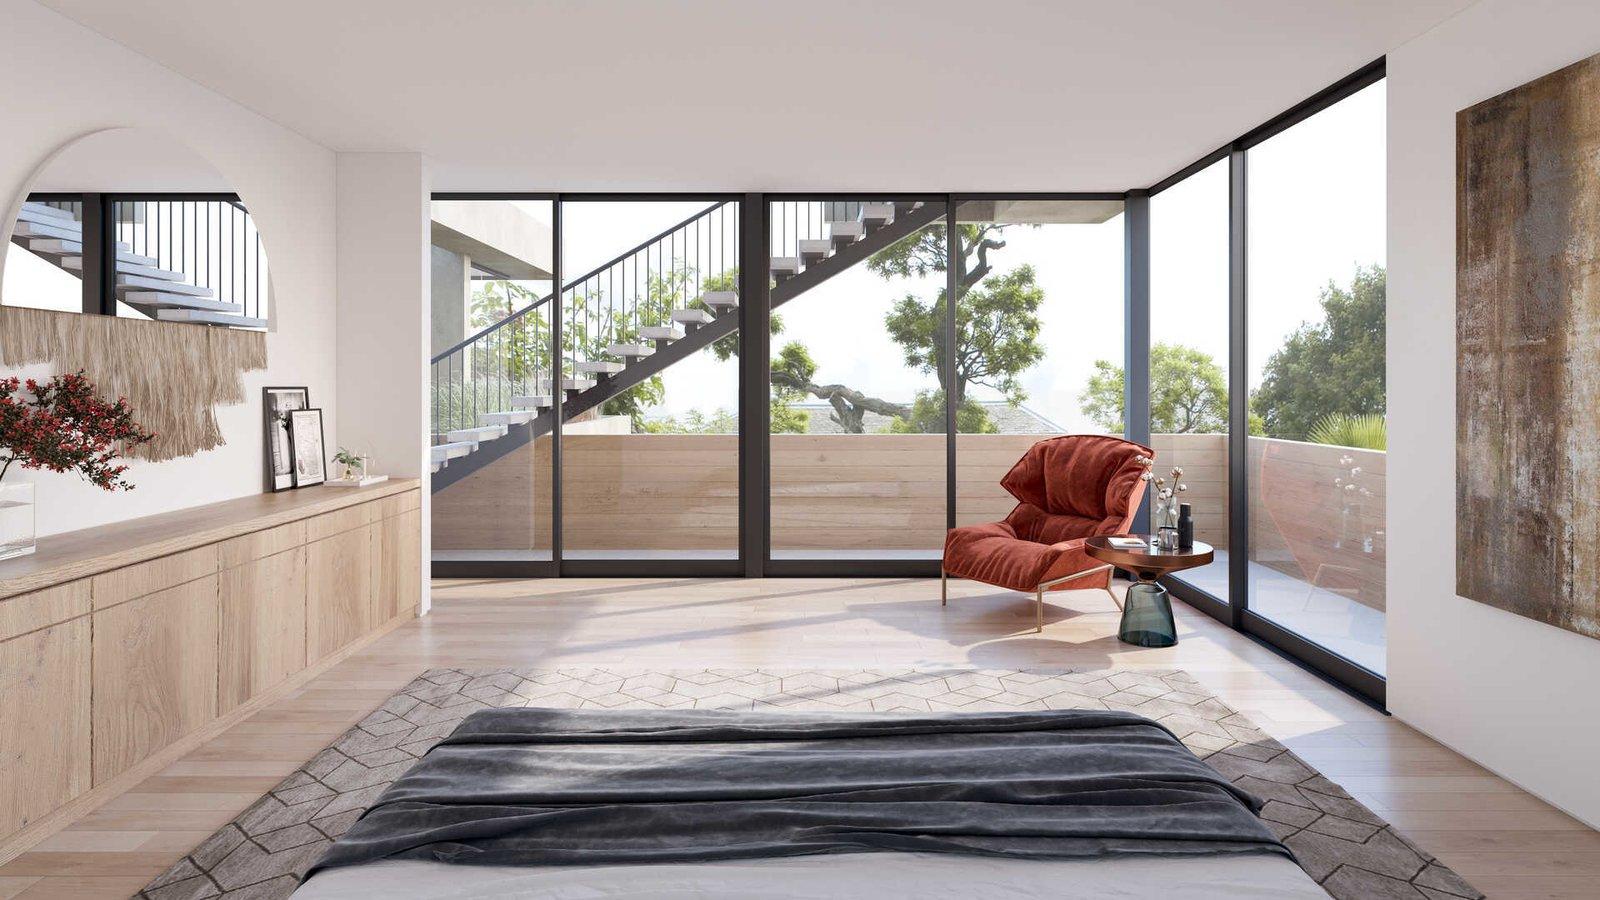 Living Room, Chair, and Light Hardwood Floor  A Newly-Built Modern Hilltop Home in Mar Vista